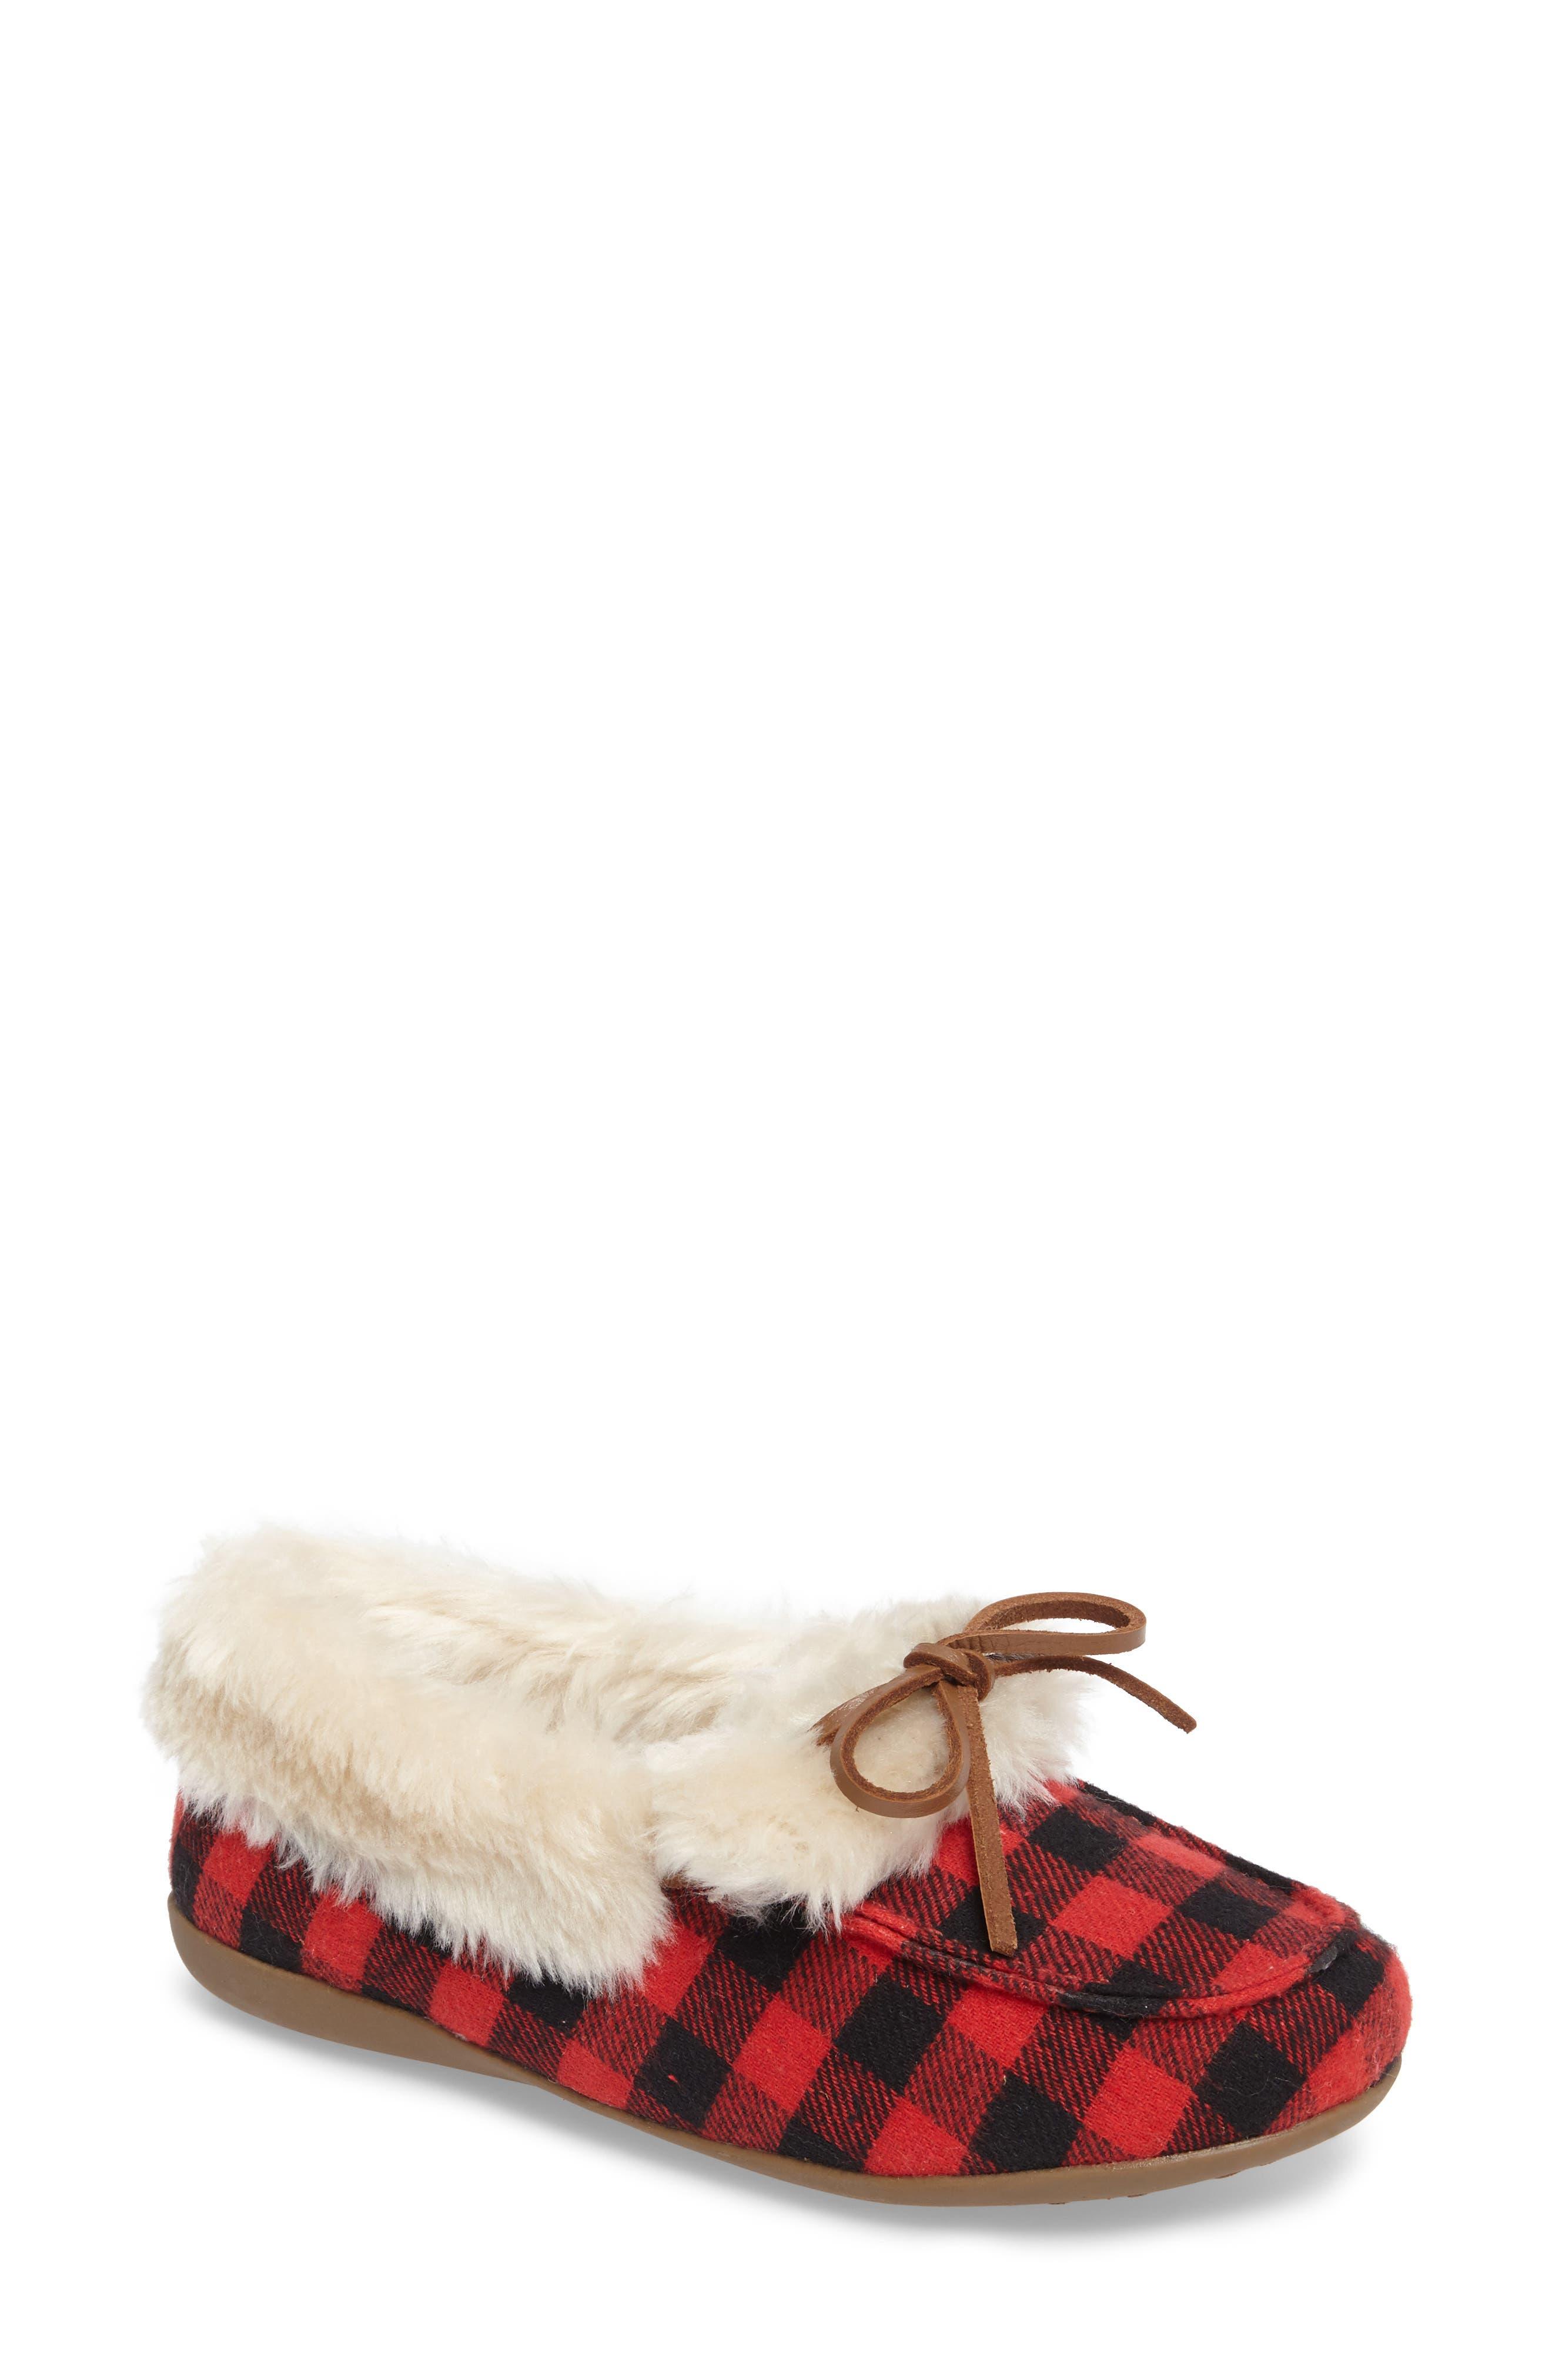 Main Image - Vionic Juniper Faux Fur Slipper (Women)